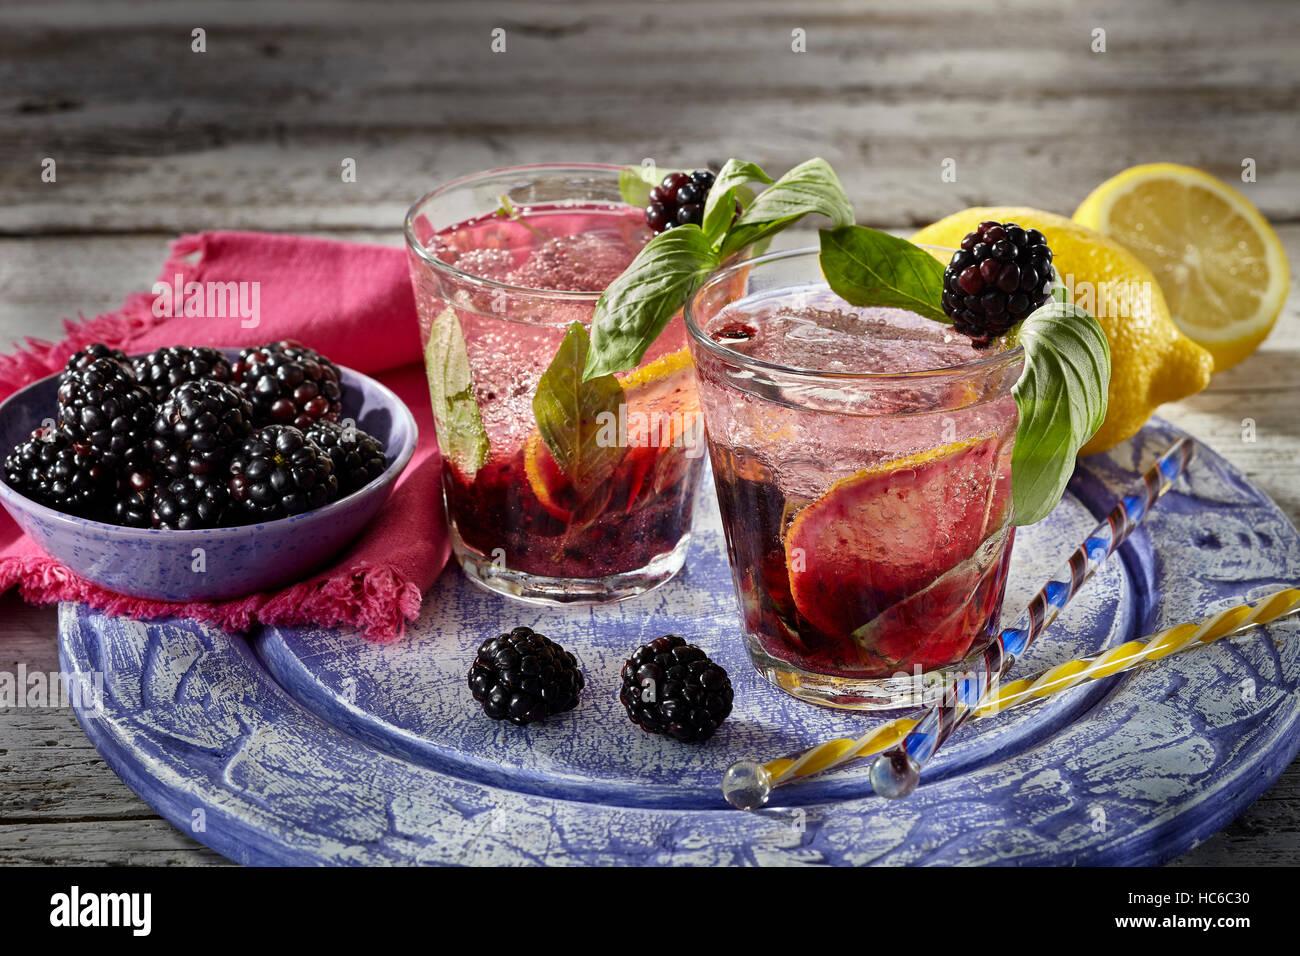 Blackberry surprise - Stock Image